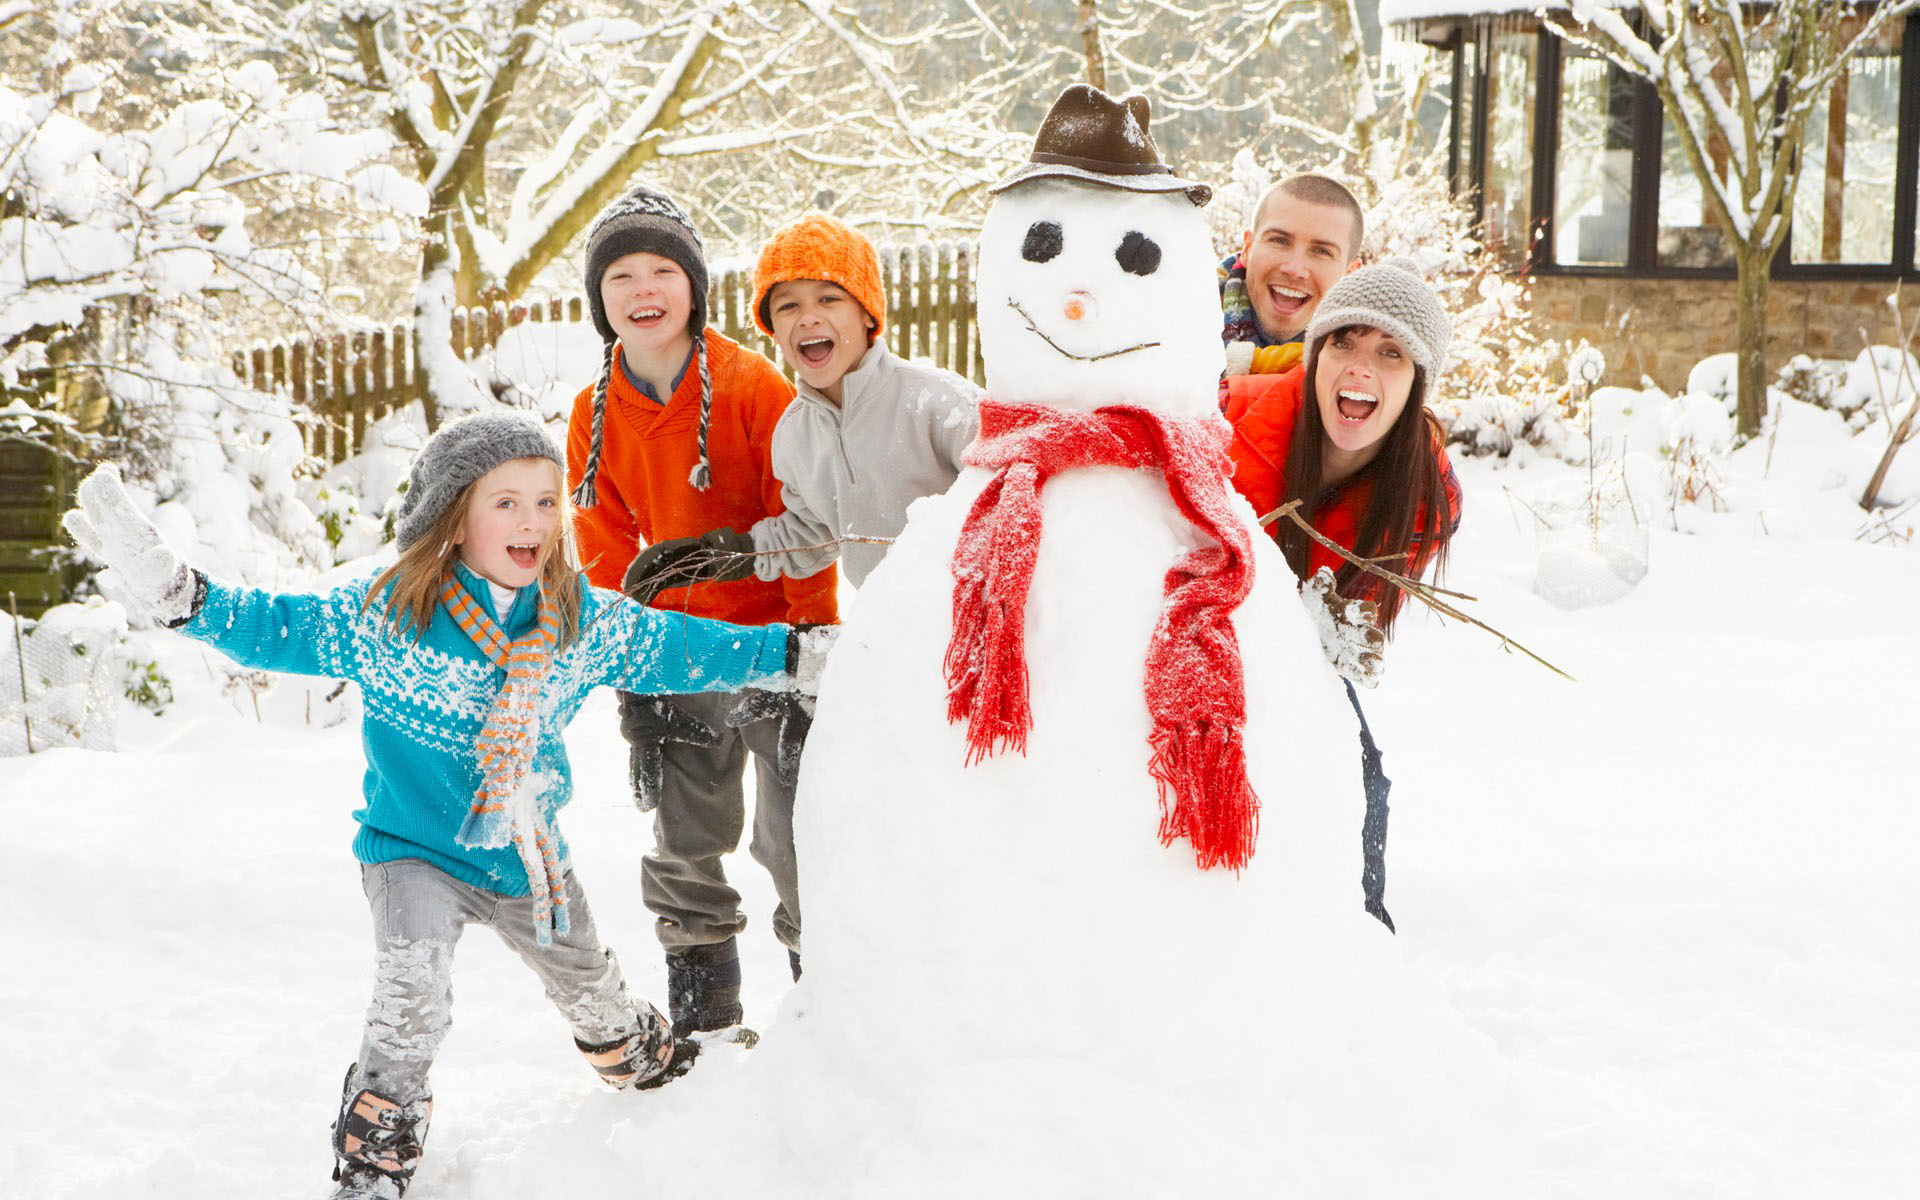 Вся семья вместе - снеговик